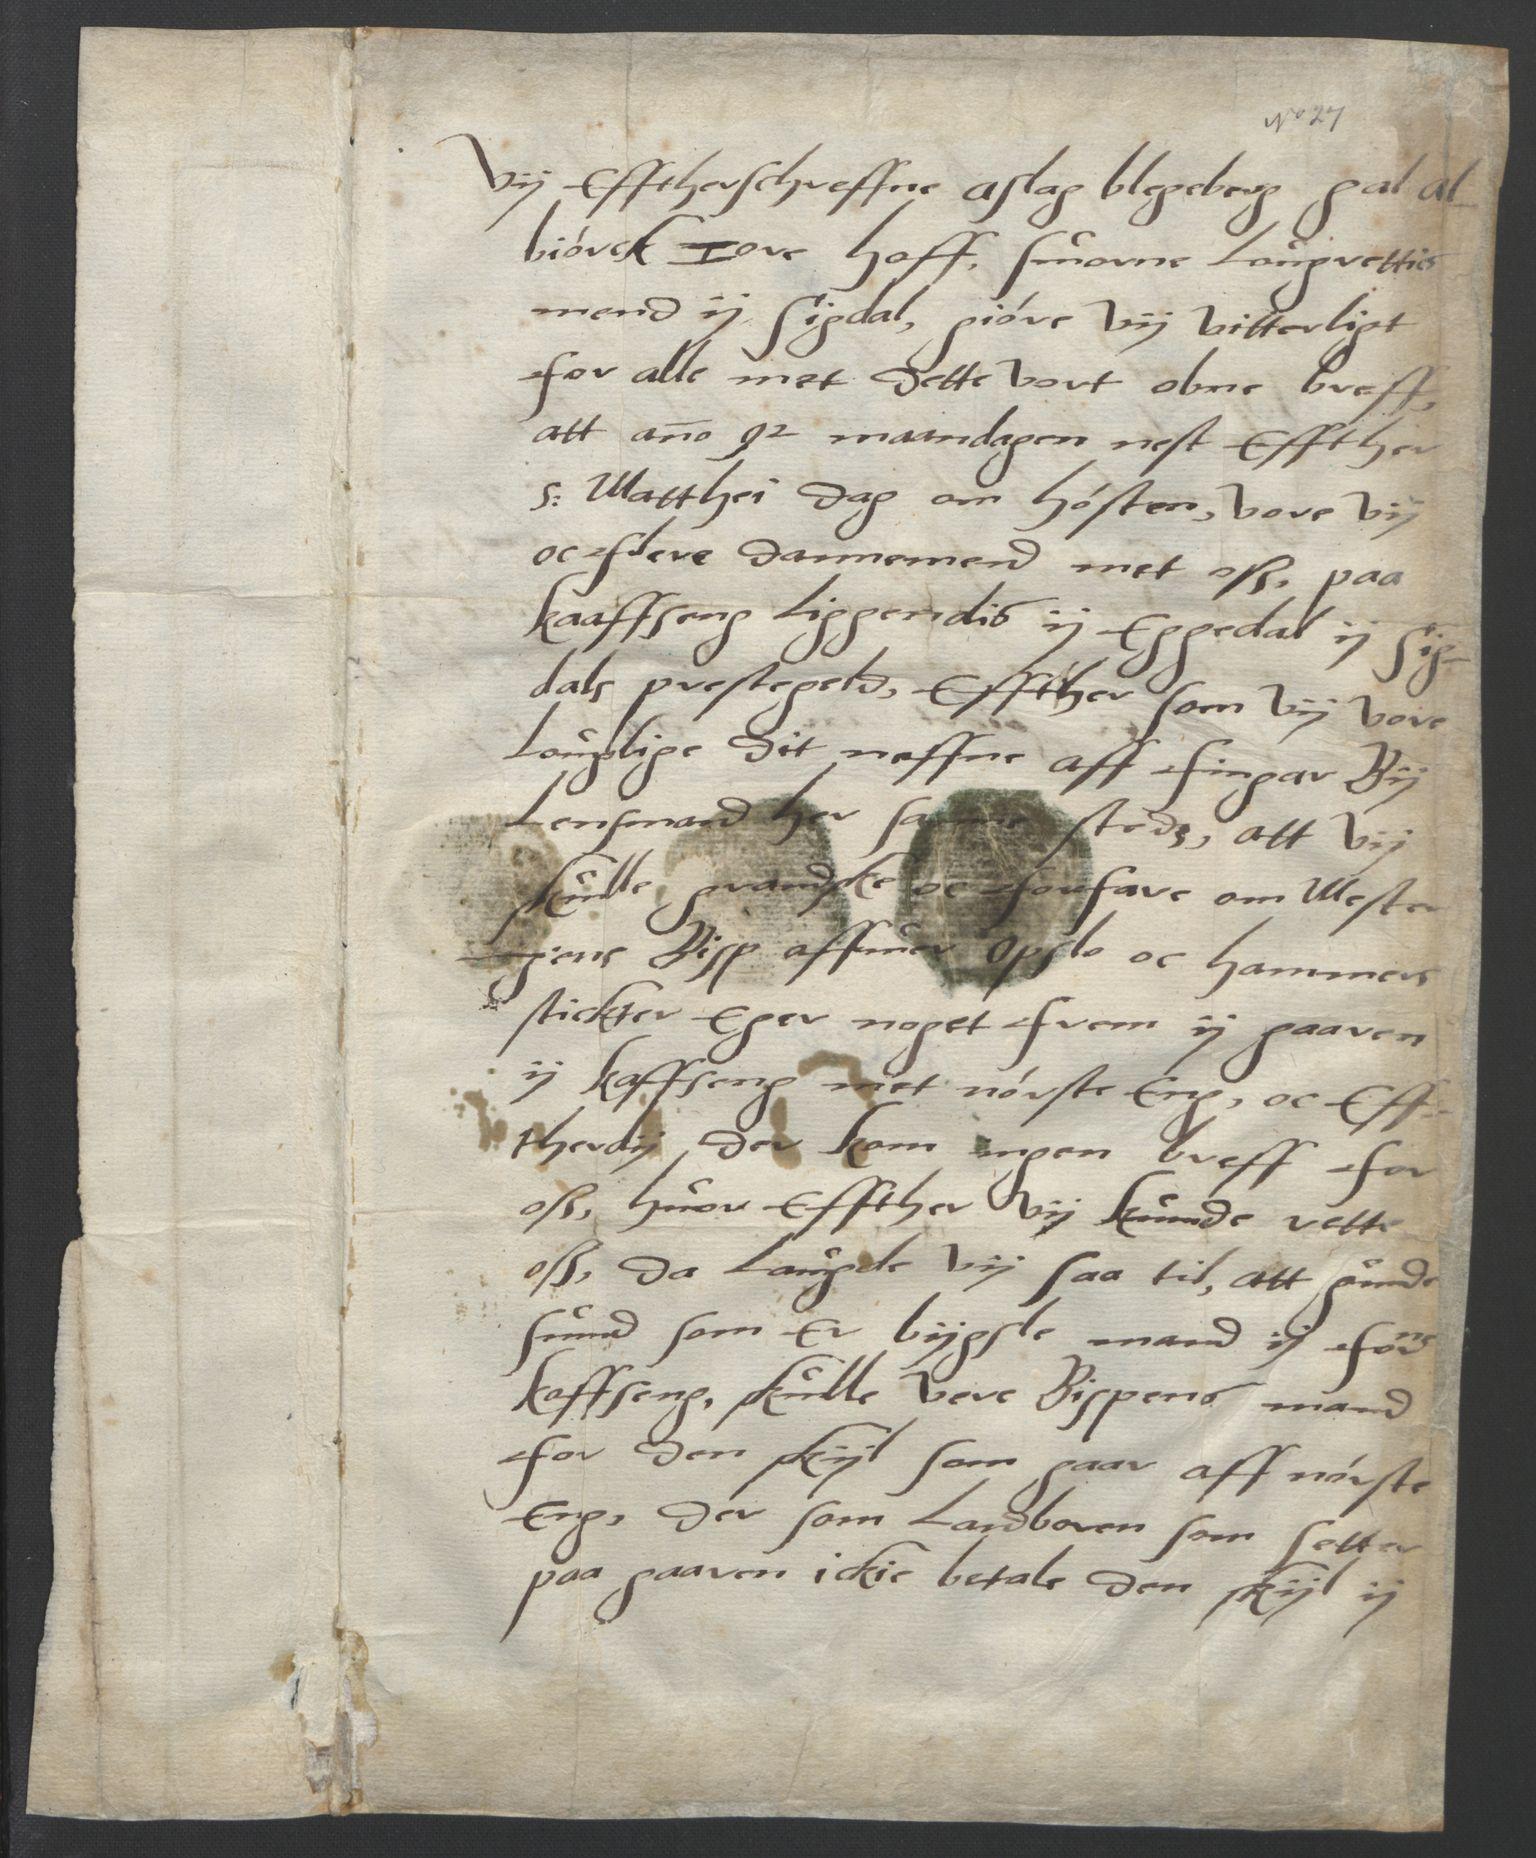 SAO, Oslo stiftsdireksjon, G/Gb/L0001: Bispestolens dokumenter, 1584-1612, s. 27